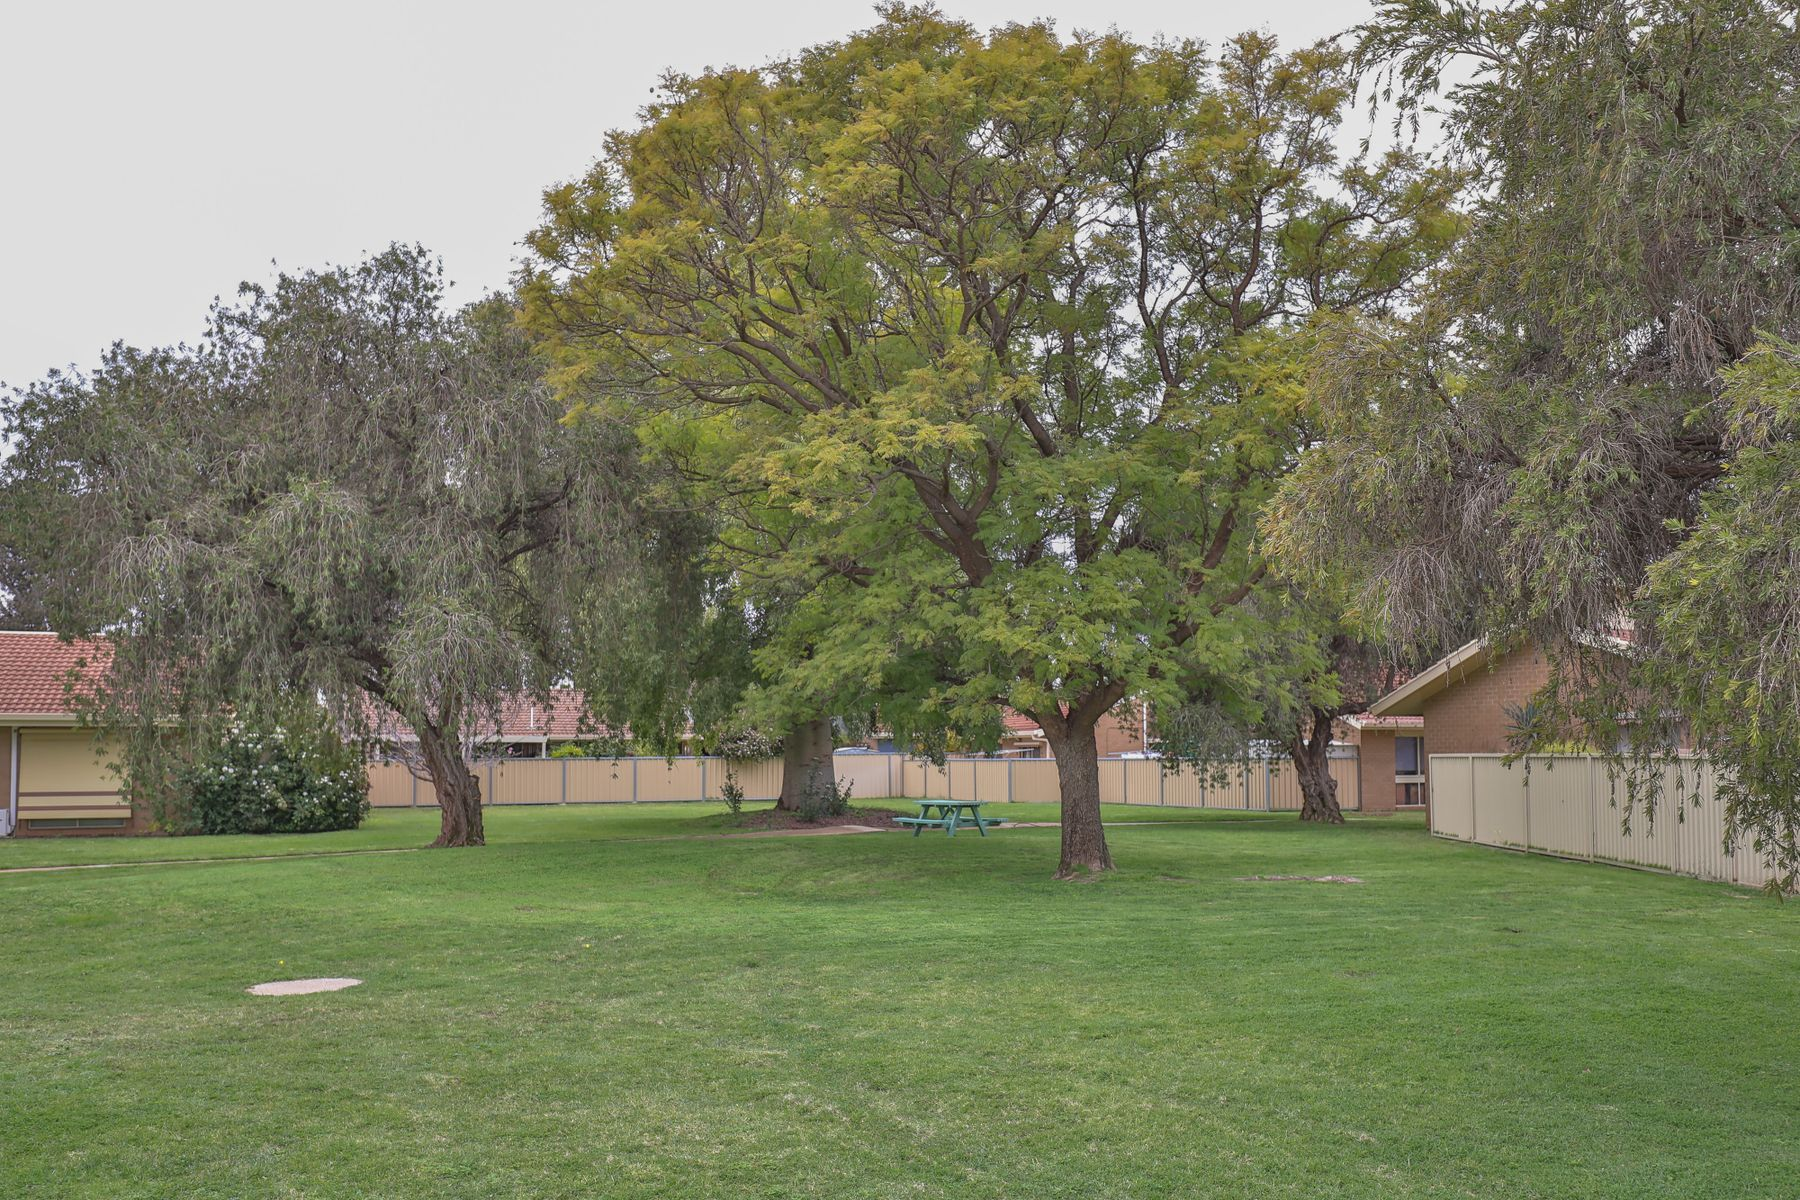 19 Hibiscus Drive, Mildura, VIC 3500